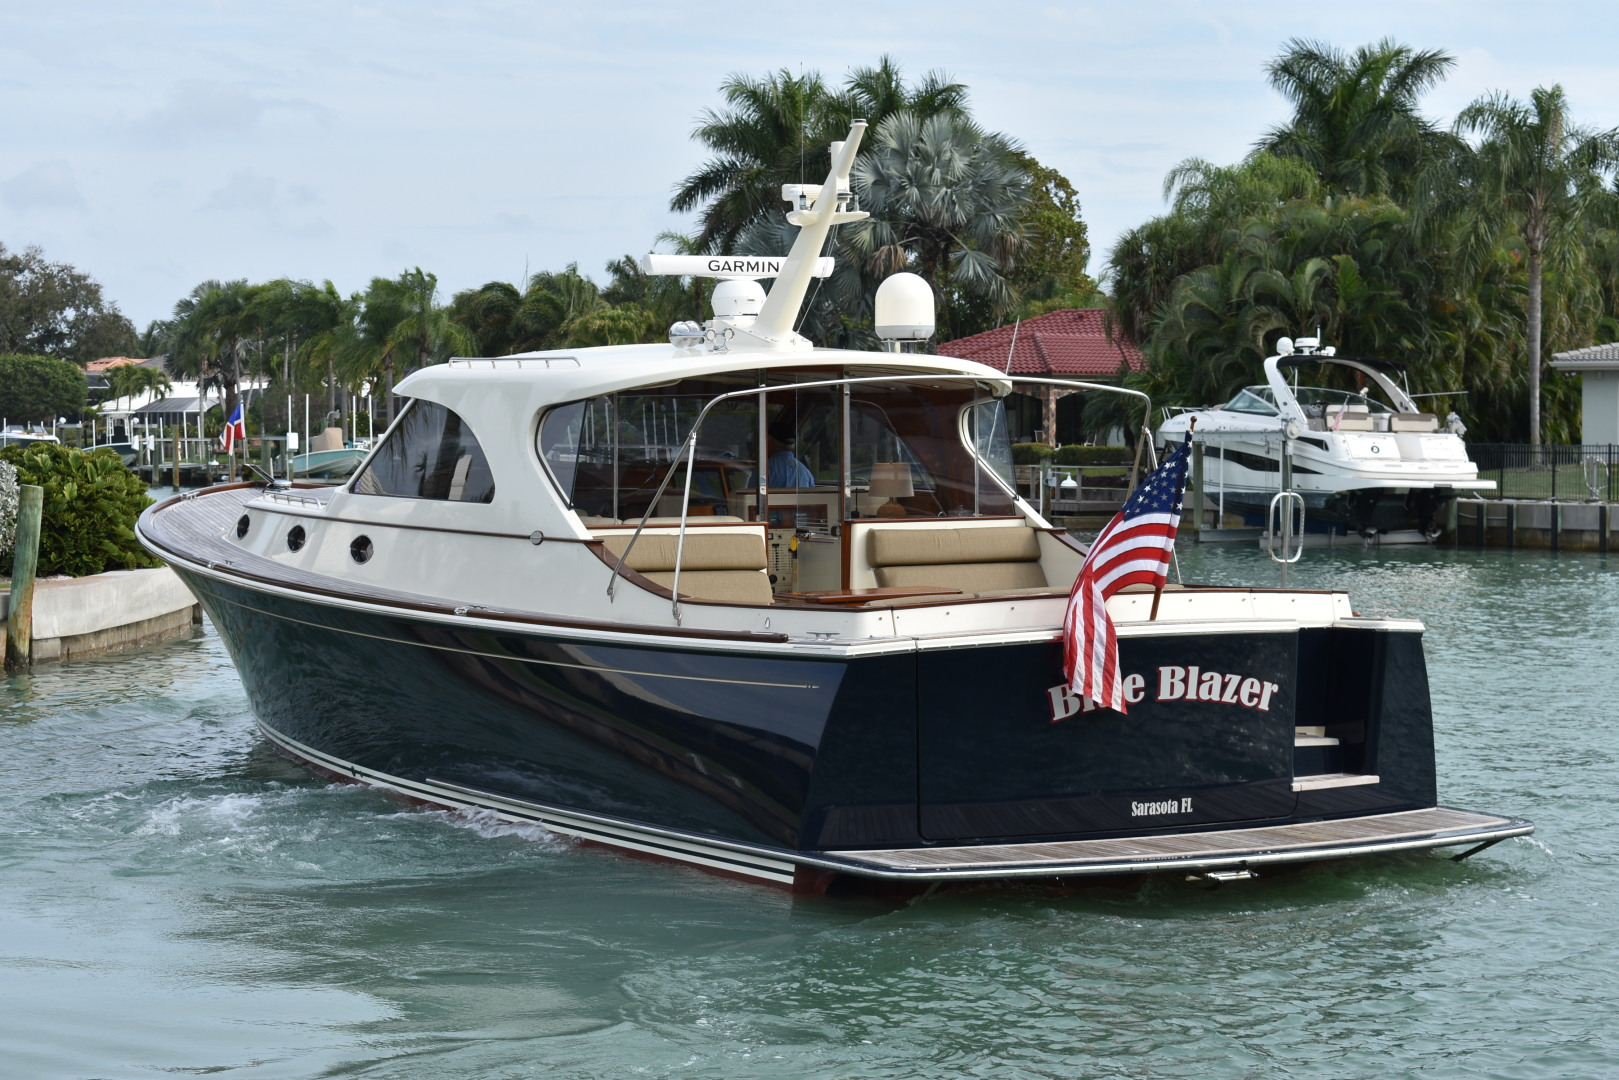 San Juan-48 express 2008-Blue Blazer Sarasota-Florida-United States-1619417 | Thumbnail